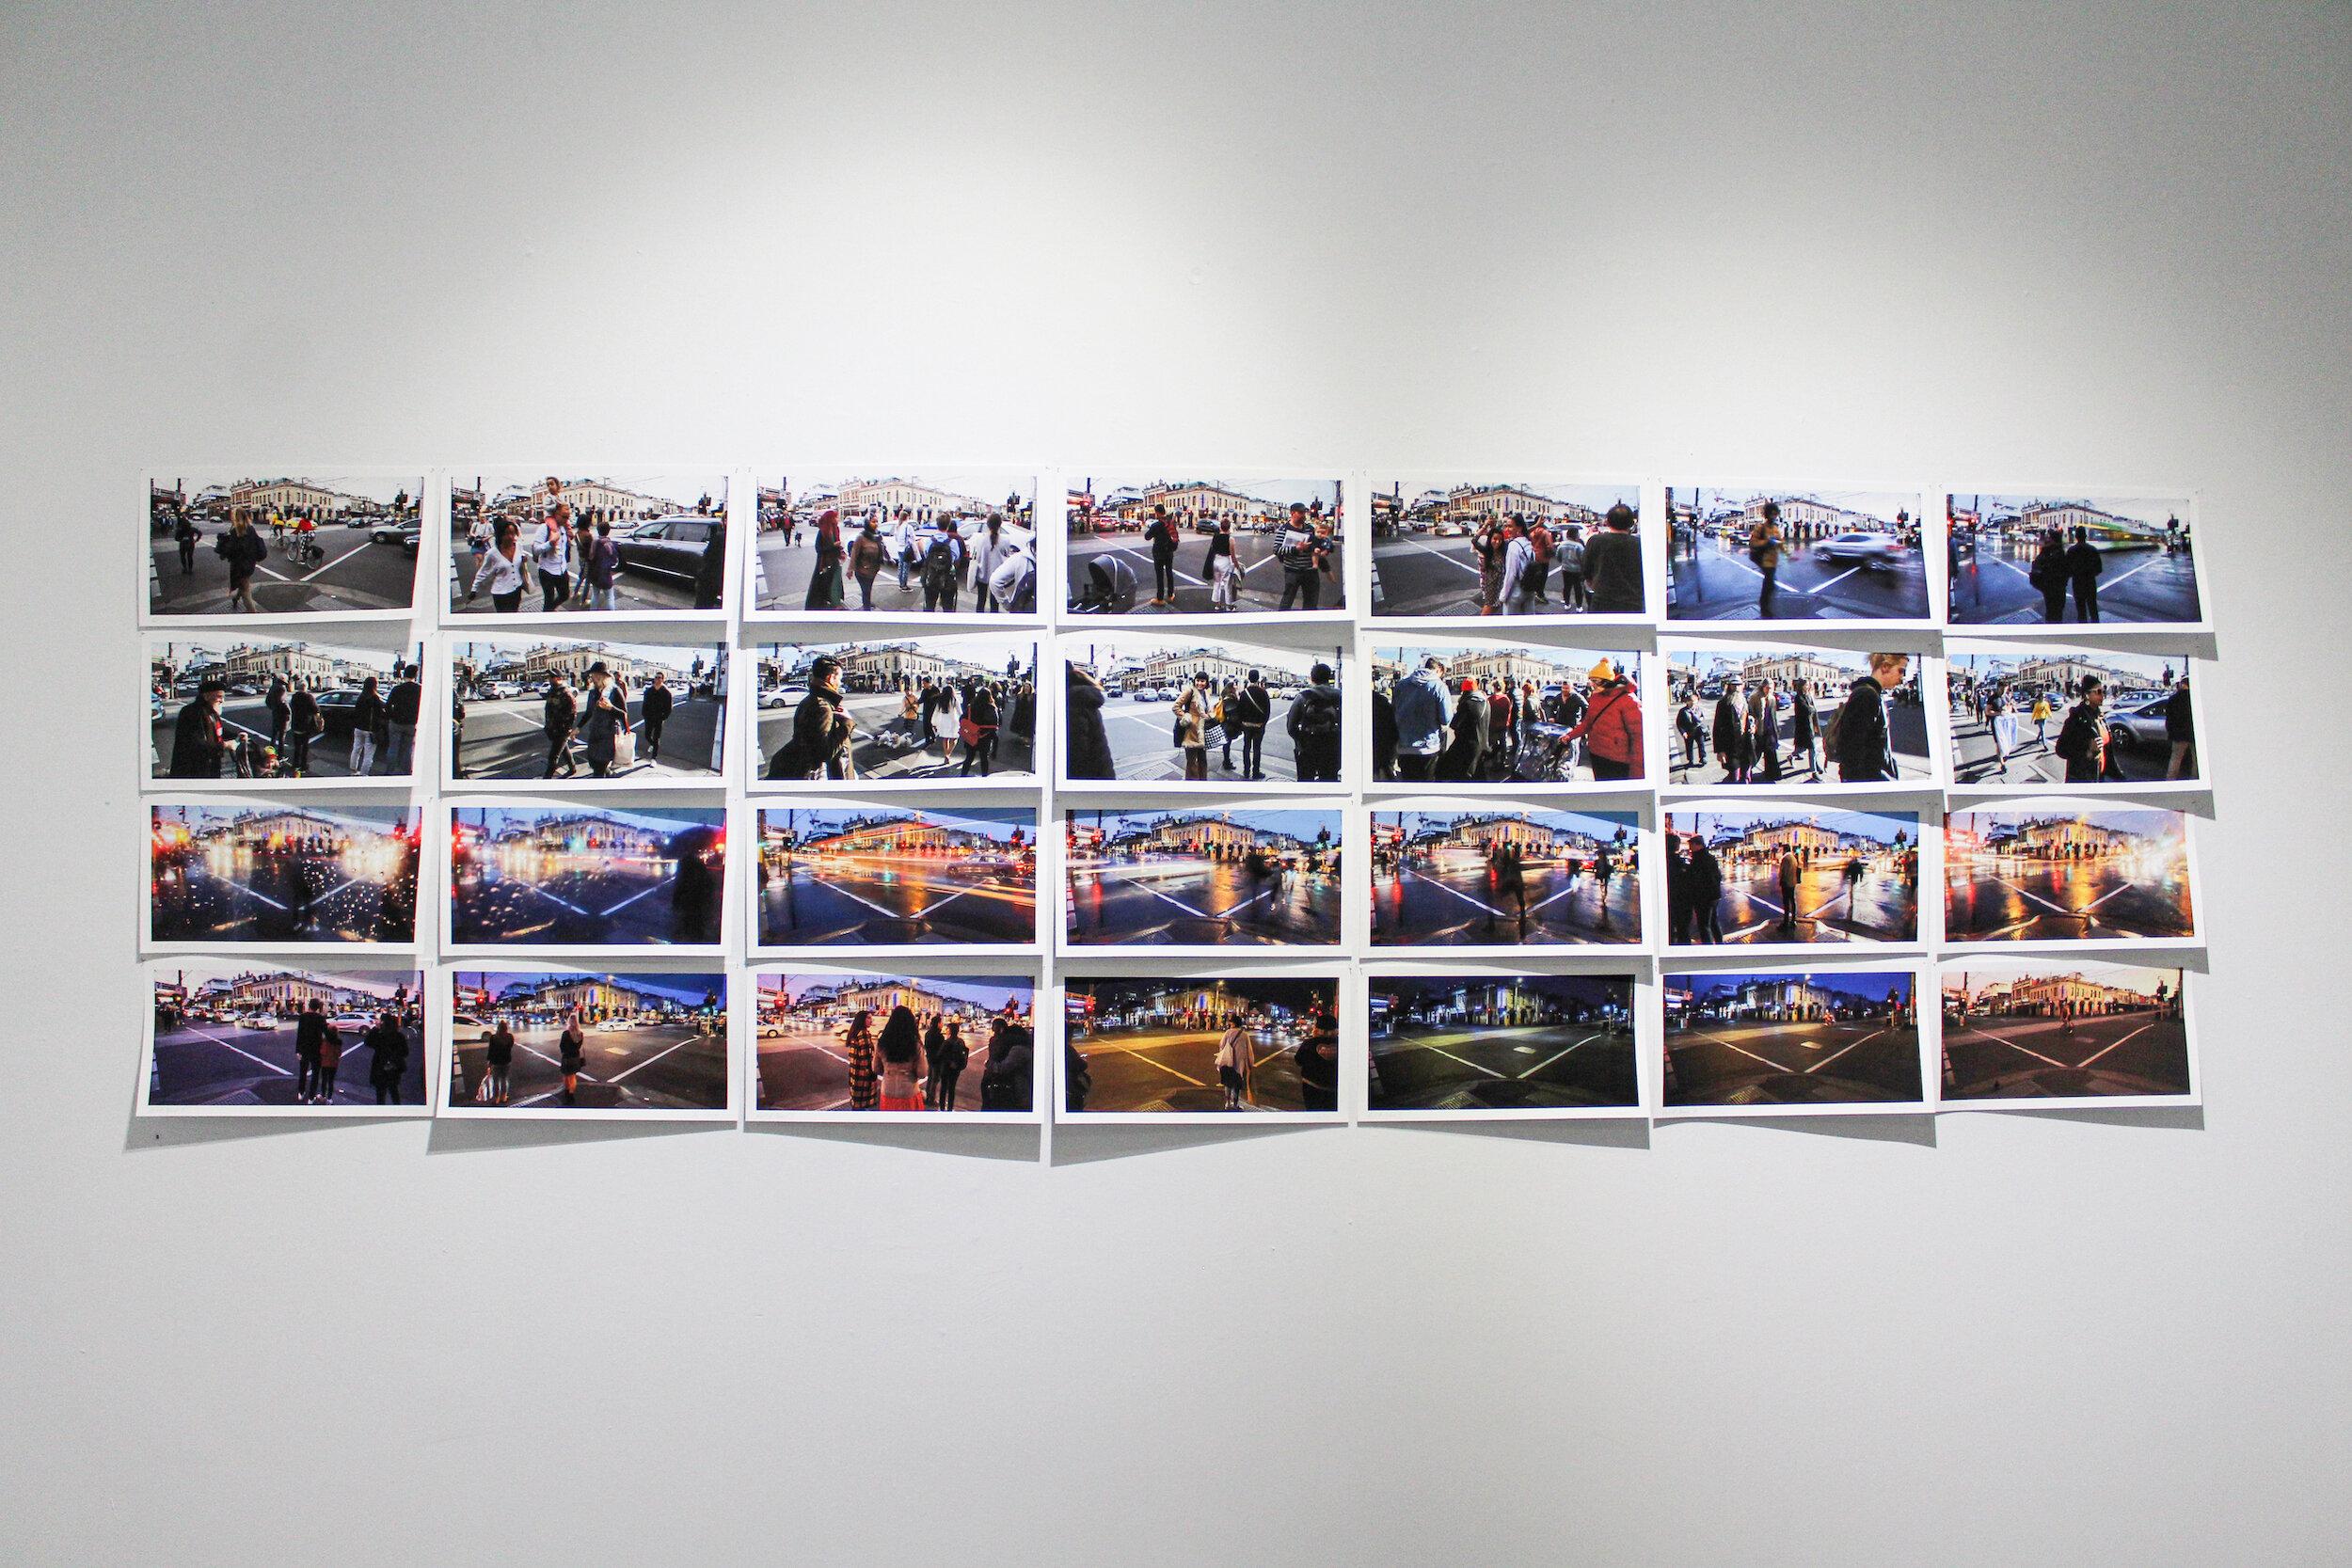 Ian Kuchel.  Acts 1 to 4, 7 scenes each , giclée prints, 39x19cm